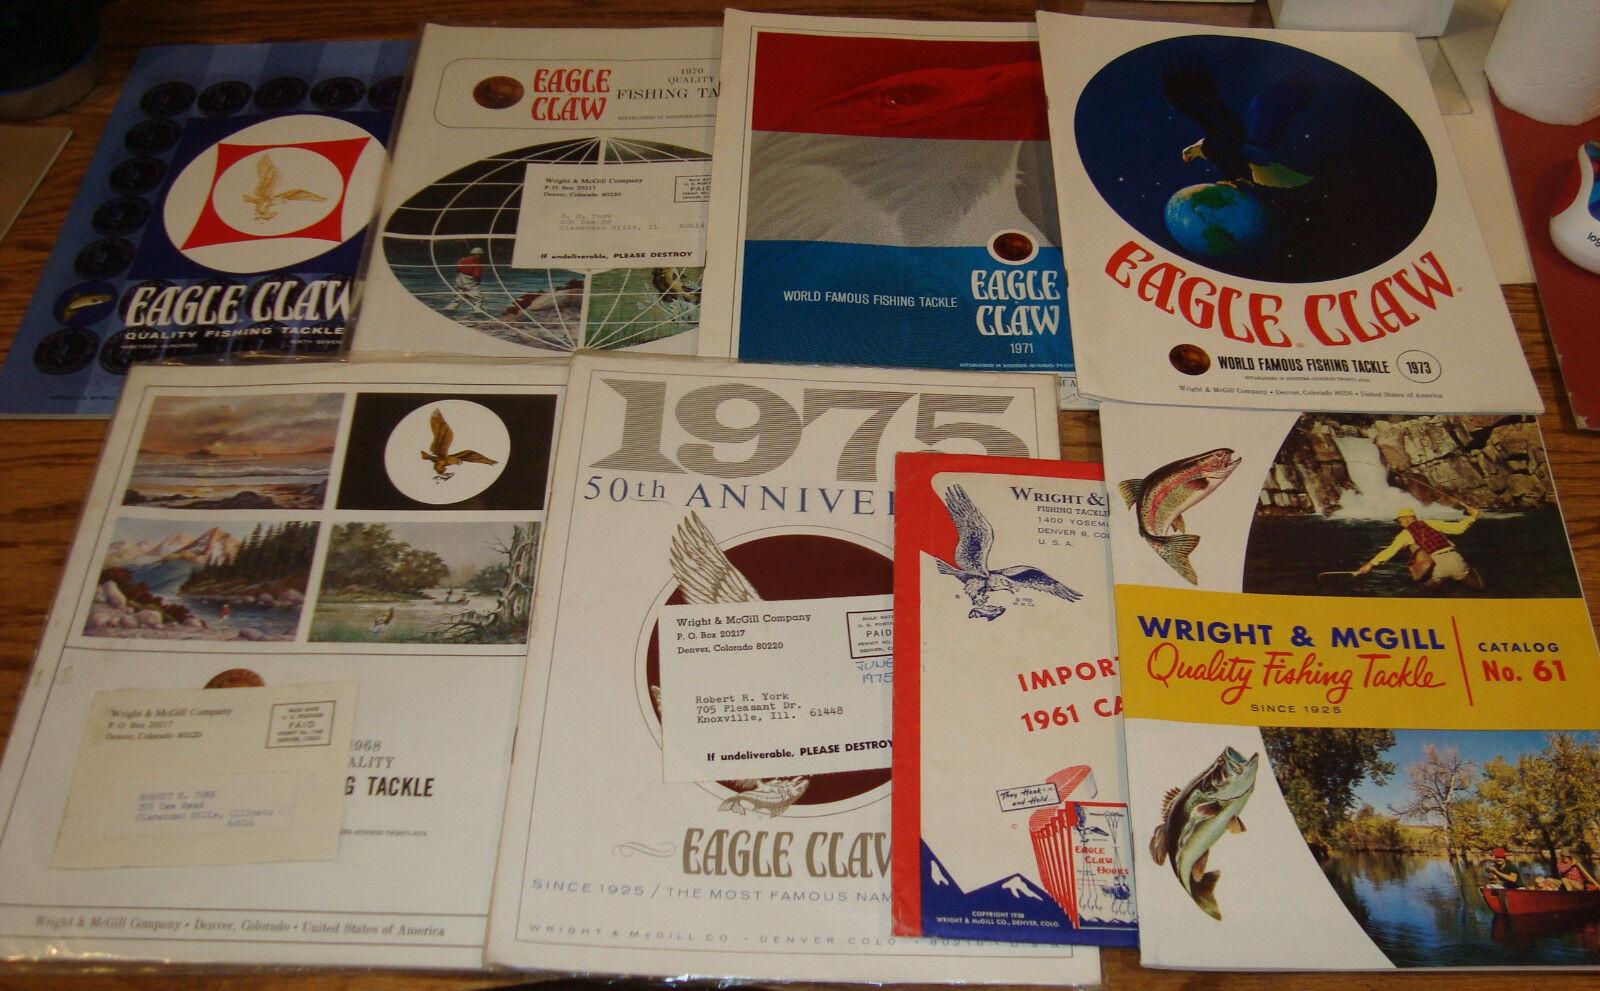 1961 - 1975 Wright & McGill Eagle Claw Fishing Tackle Grünriebsbroschüre Lot of 7